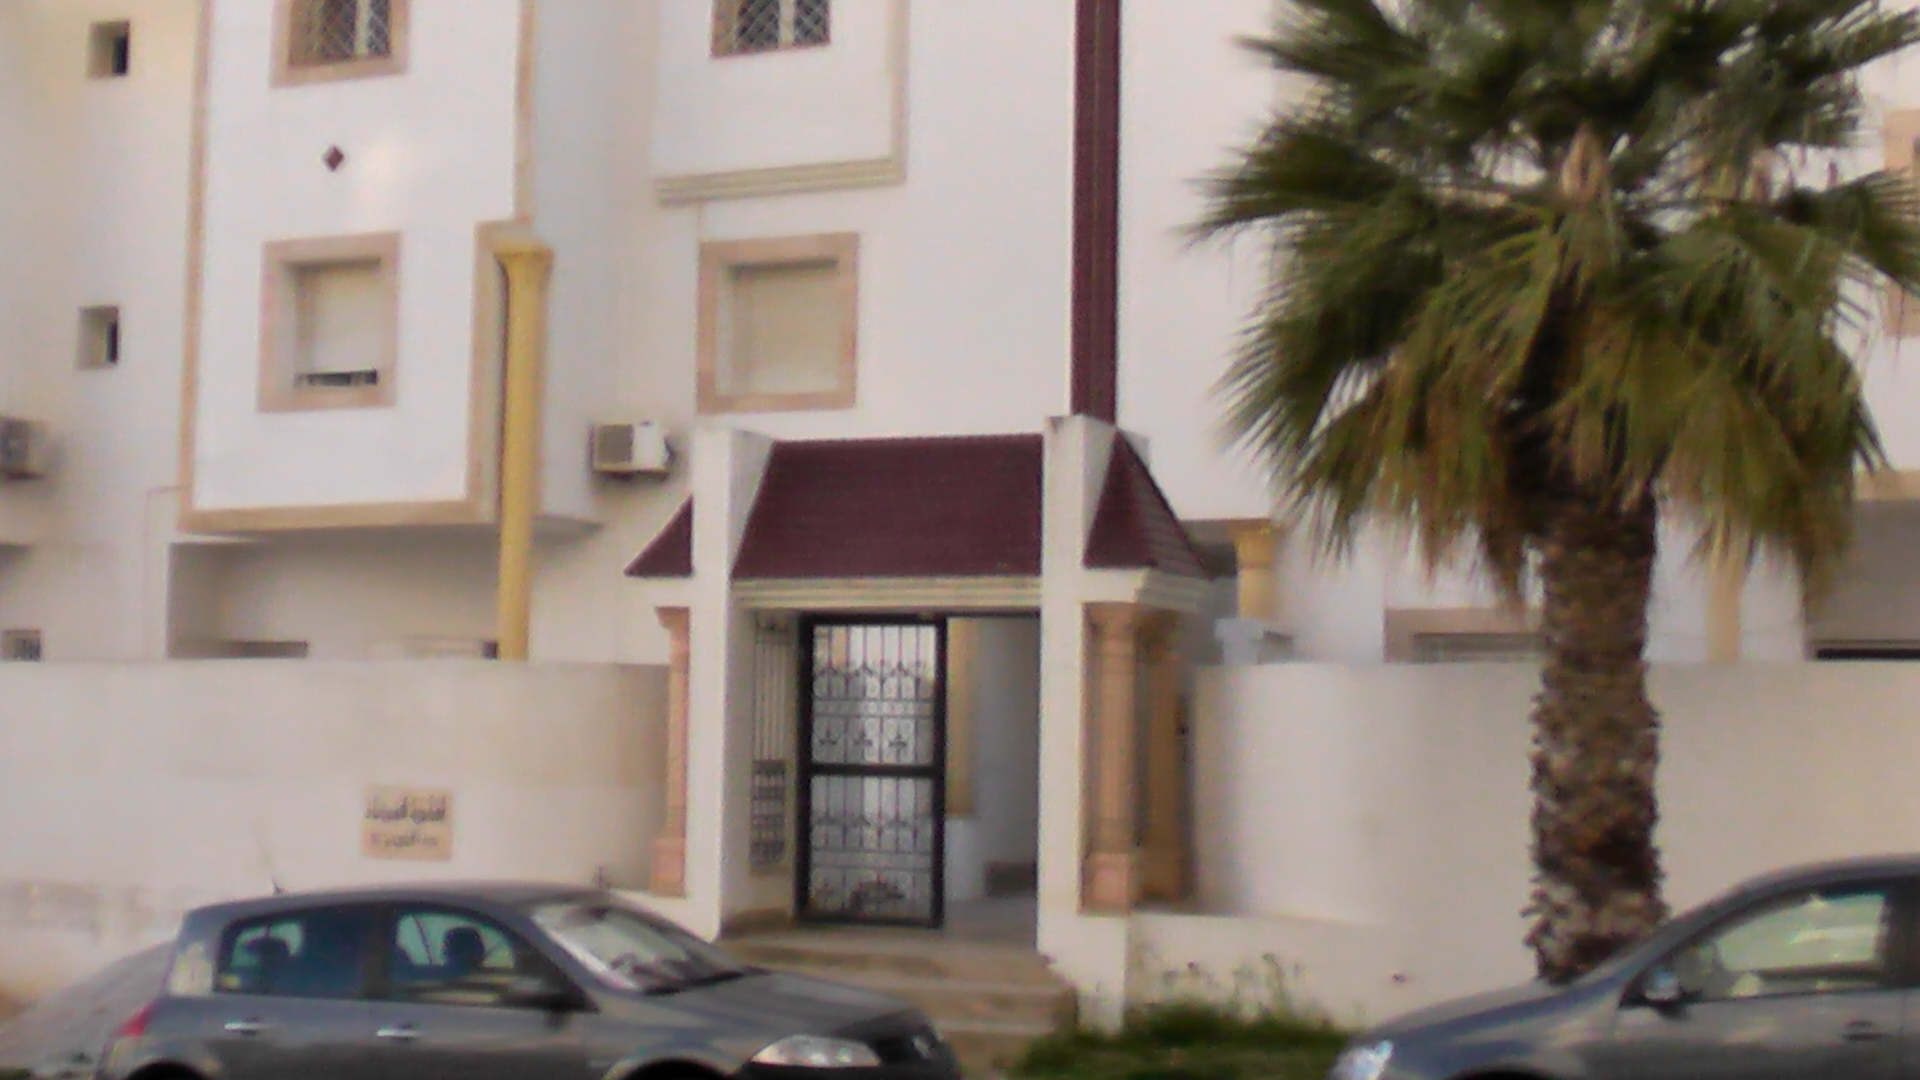 Ariana Tunisie vente achat location appartement terrain maison villa Tunis